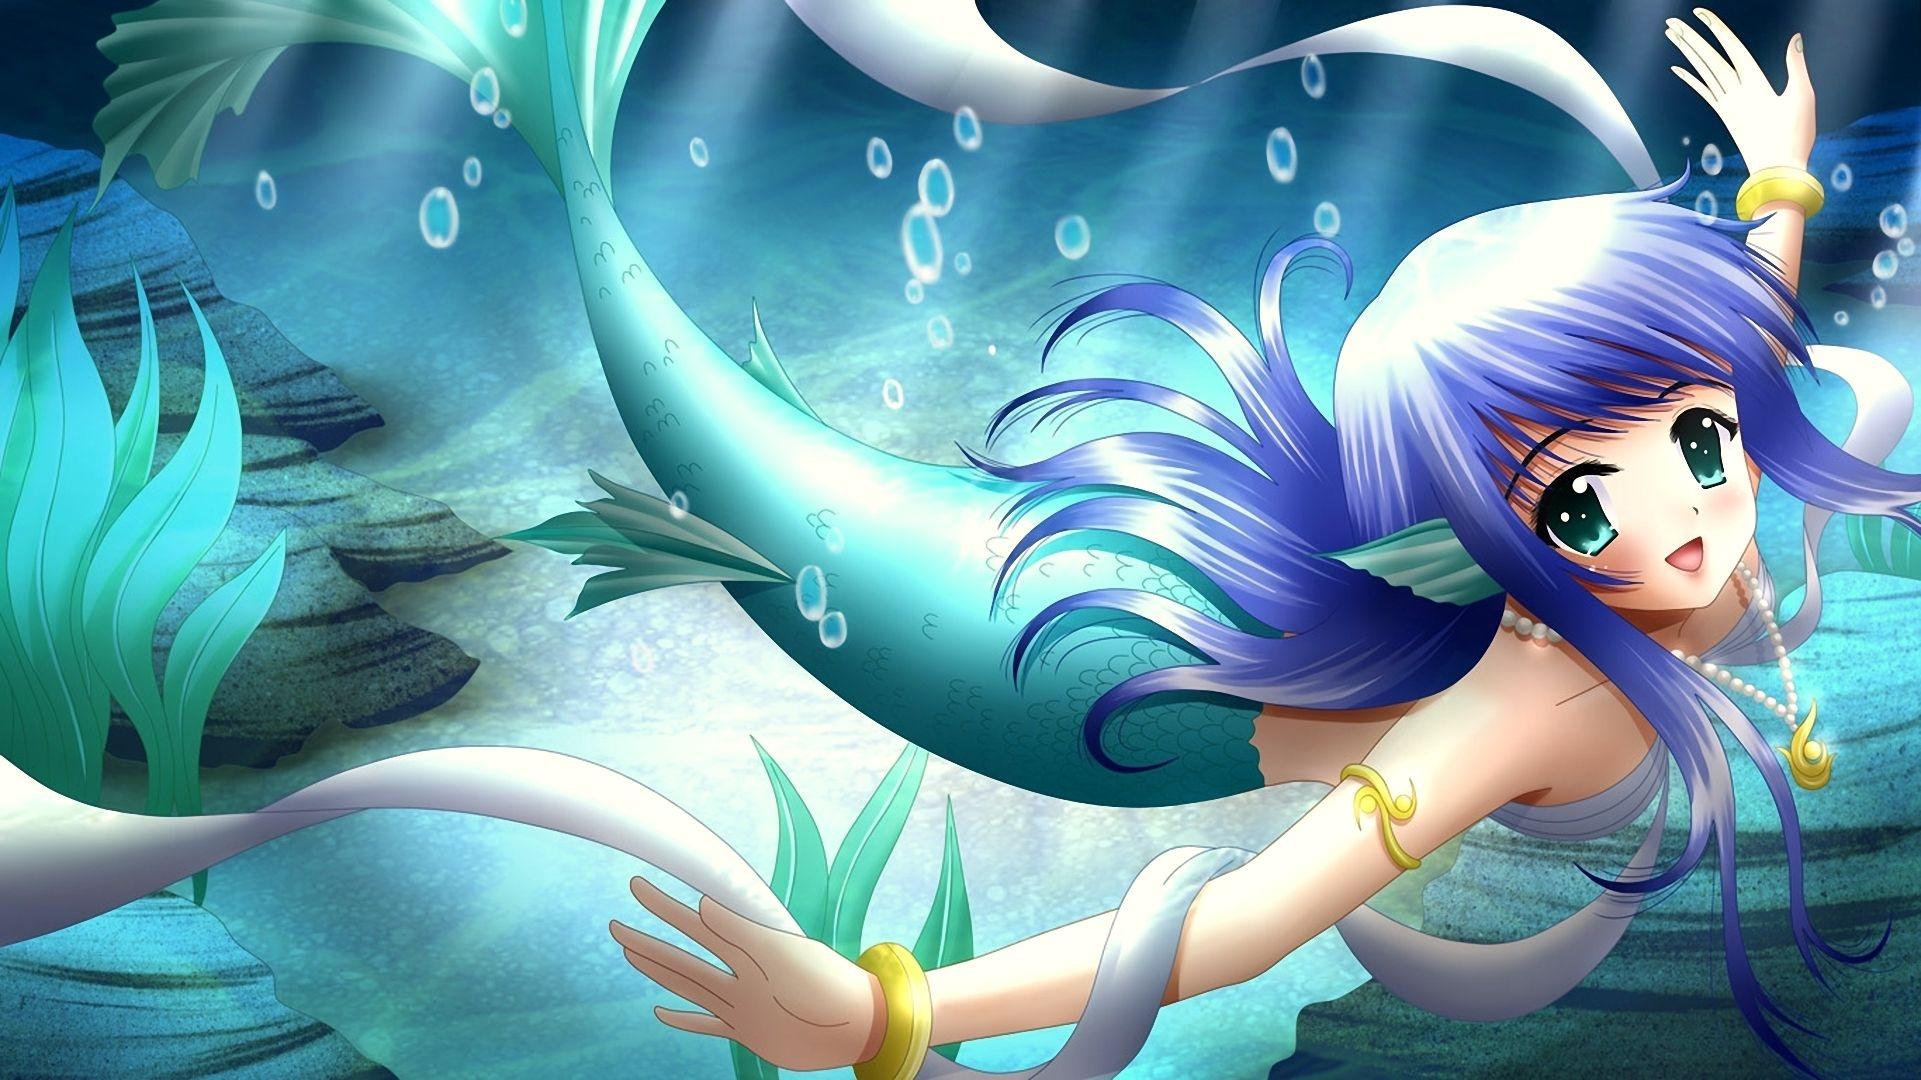 anime girl mermaid tail smile